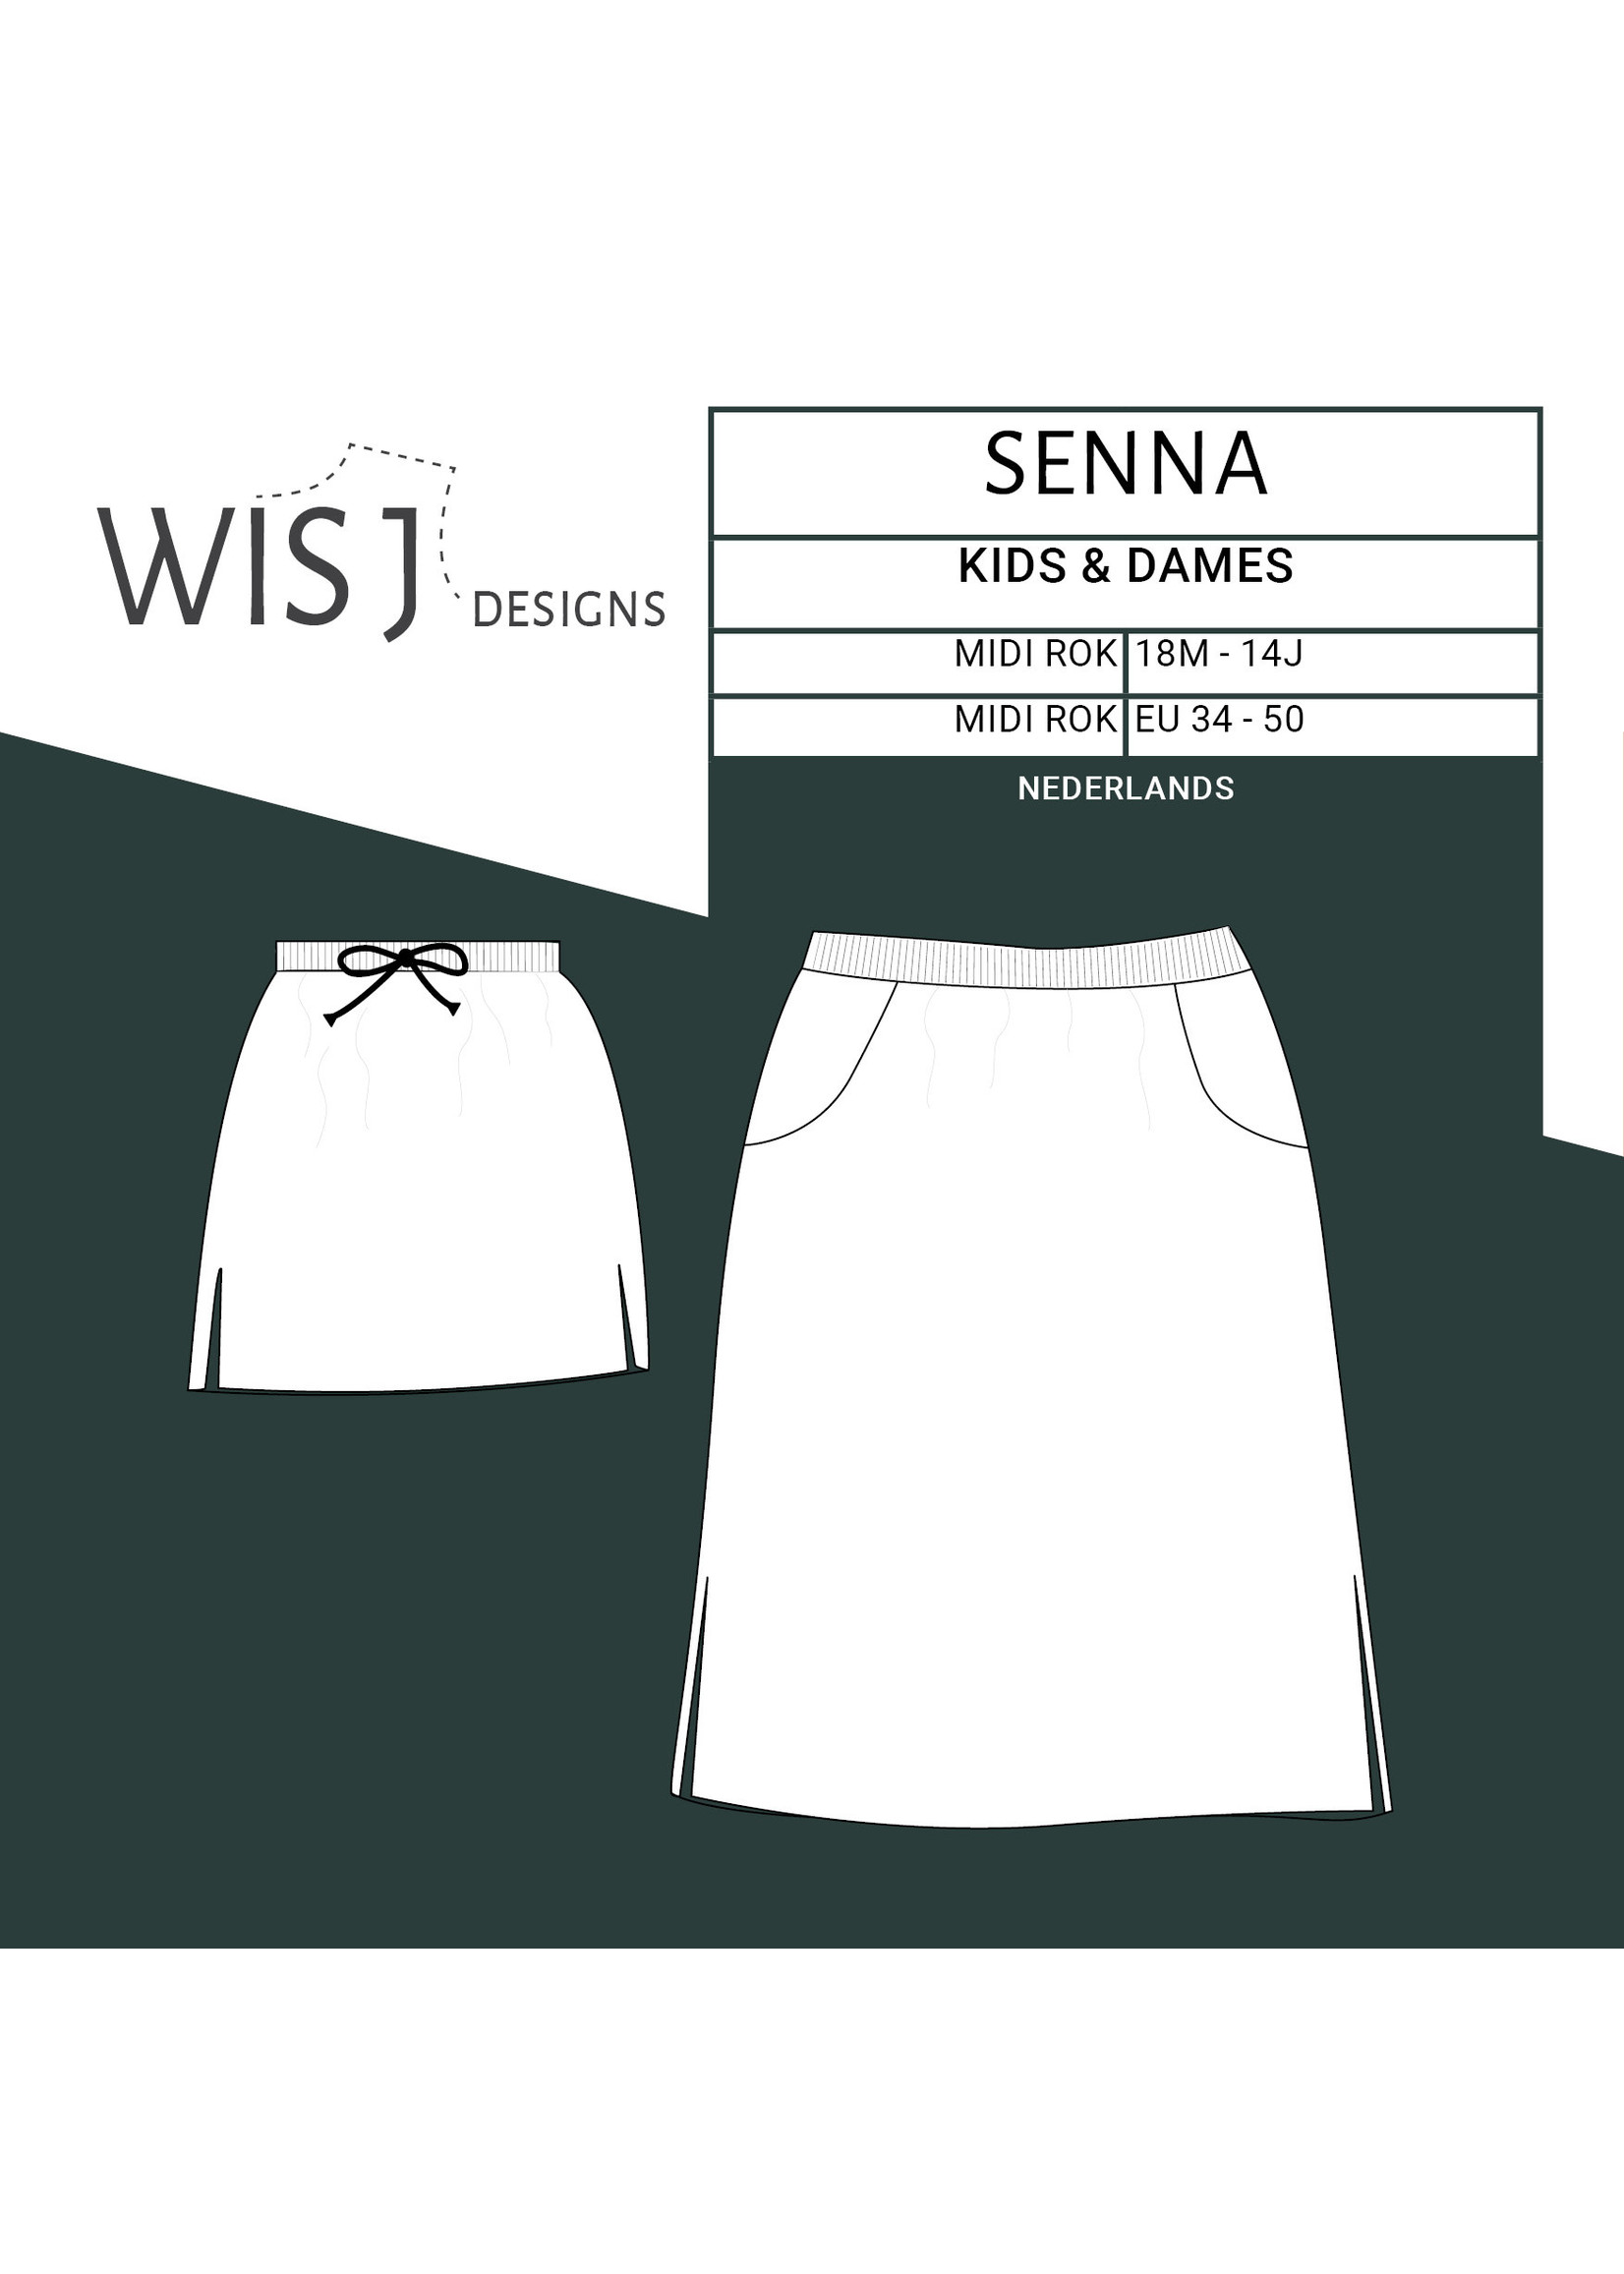 Wisj Designs Senna wisj